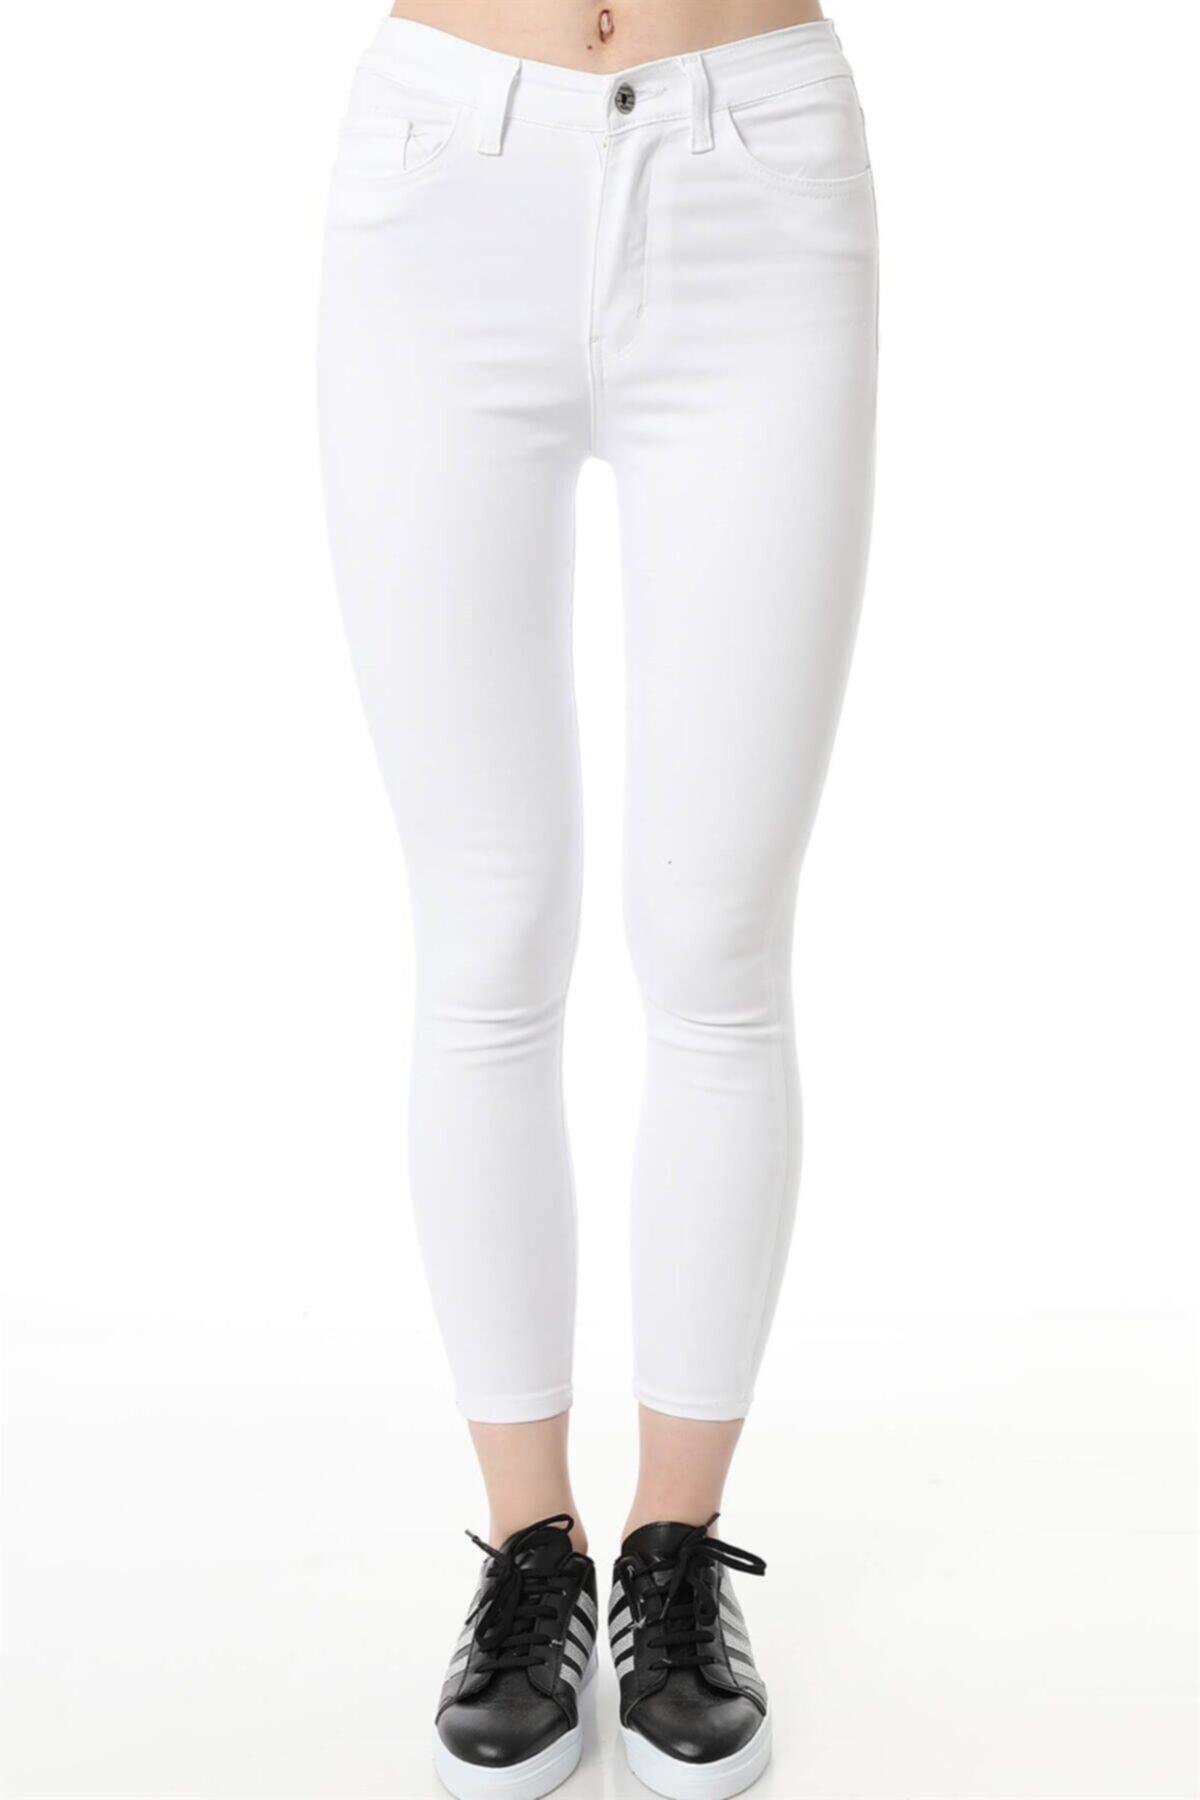 Kadın Yüksek Bel Dar Paça Skinny Fit Denim Jeans Kot Pantolon Beyaz